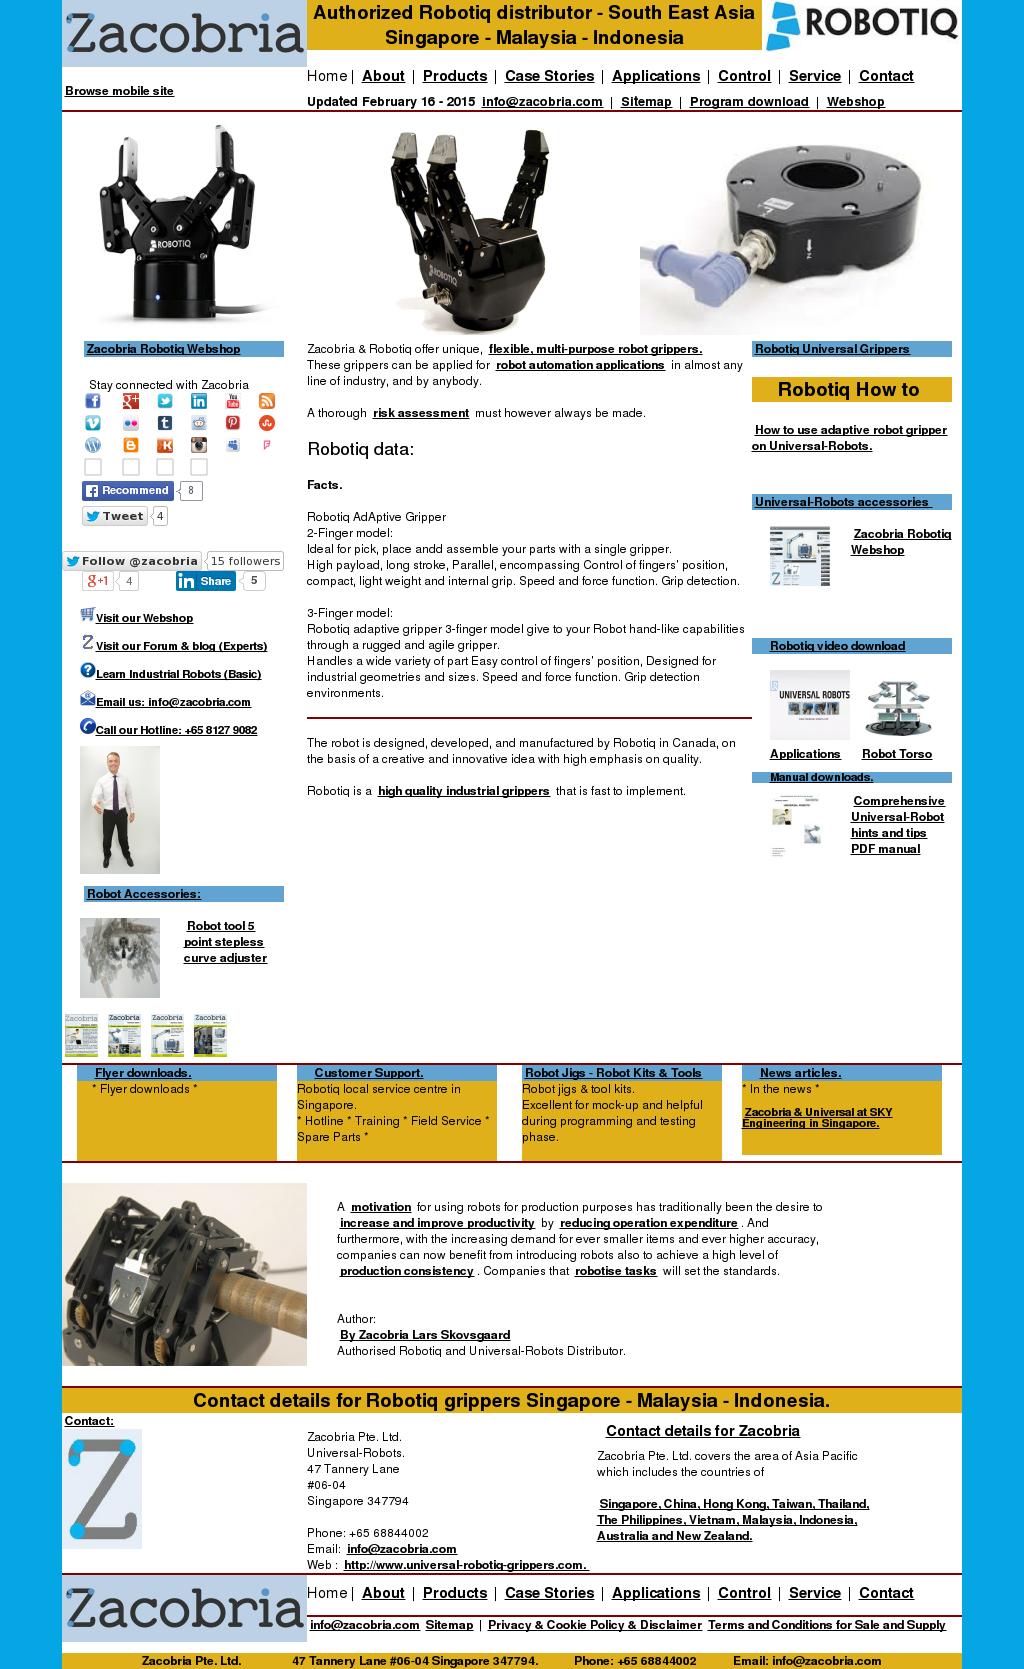 Zacobria-universal-robots Robotiq Competitors, Revenue and Employees